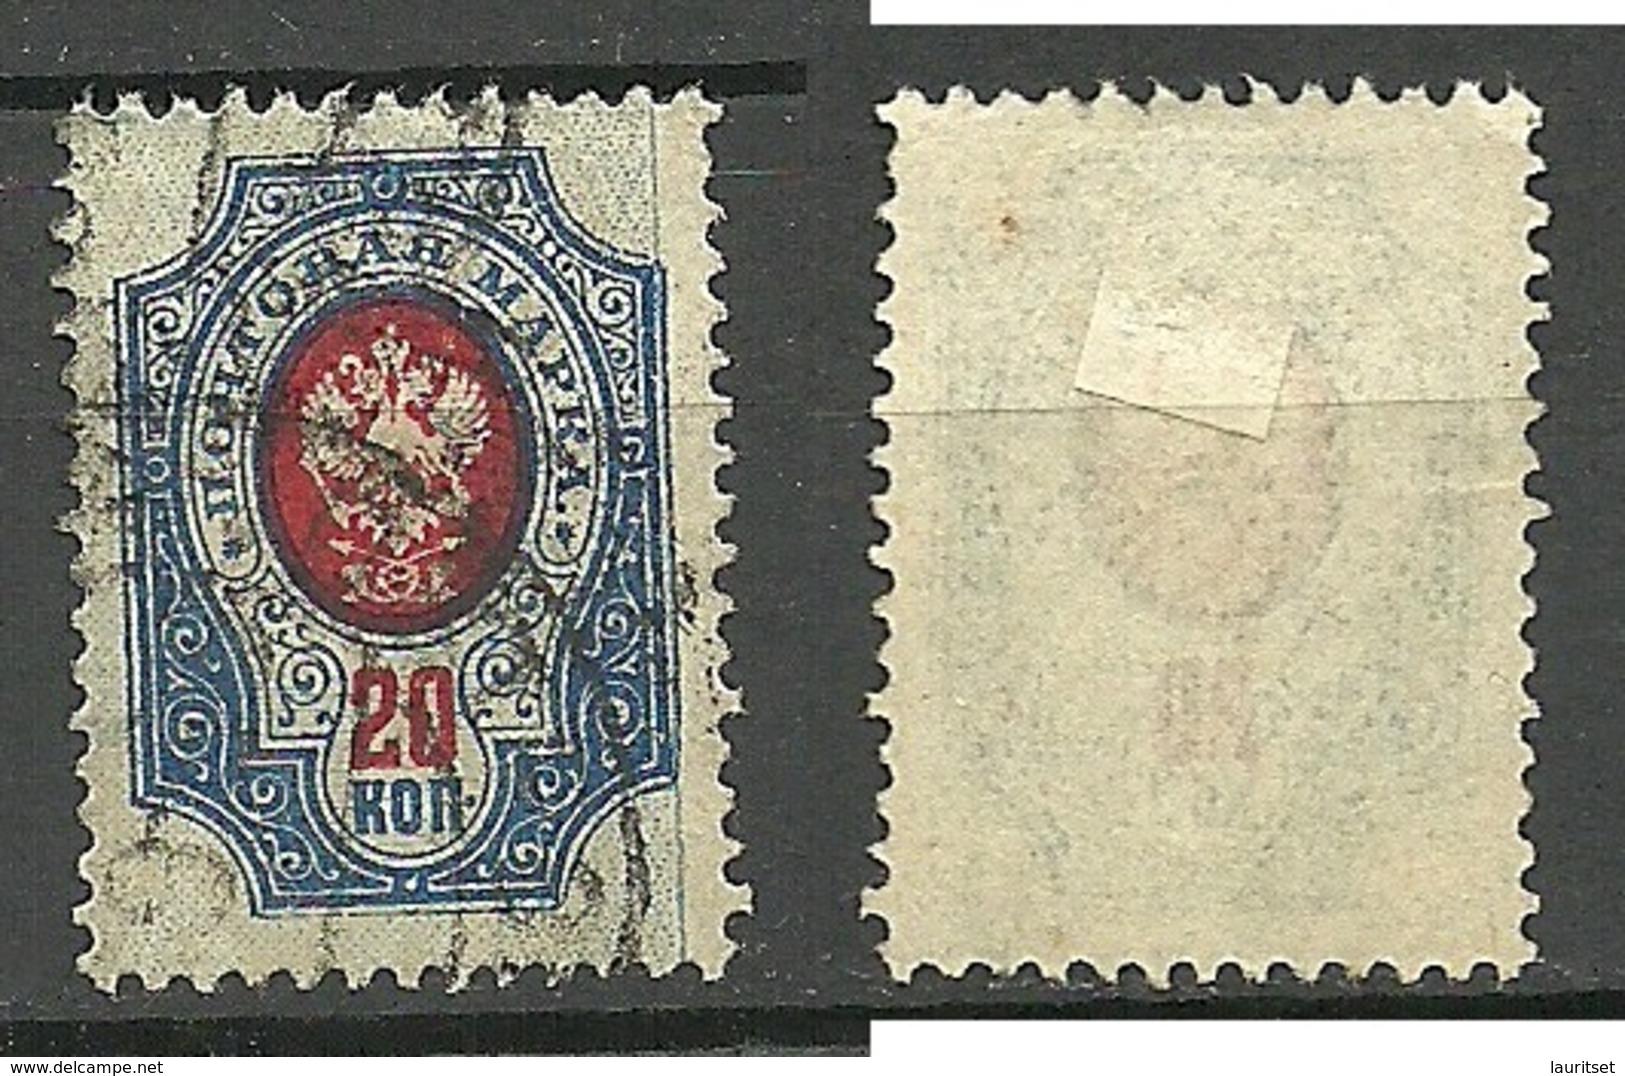 RUSSLAND RUSSIA 1912 Michel 72 ERROR Abart Shifted Net Resp Print O - Errors & Oddities